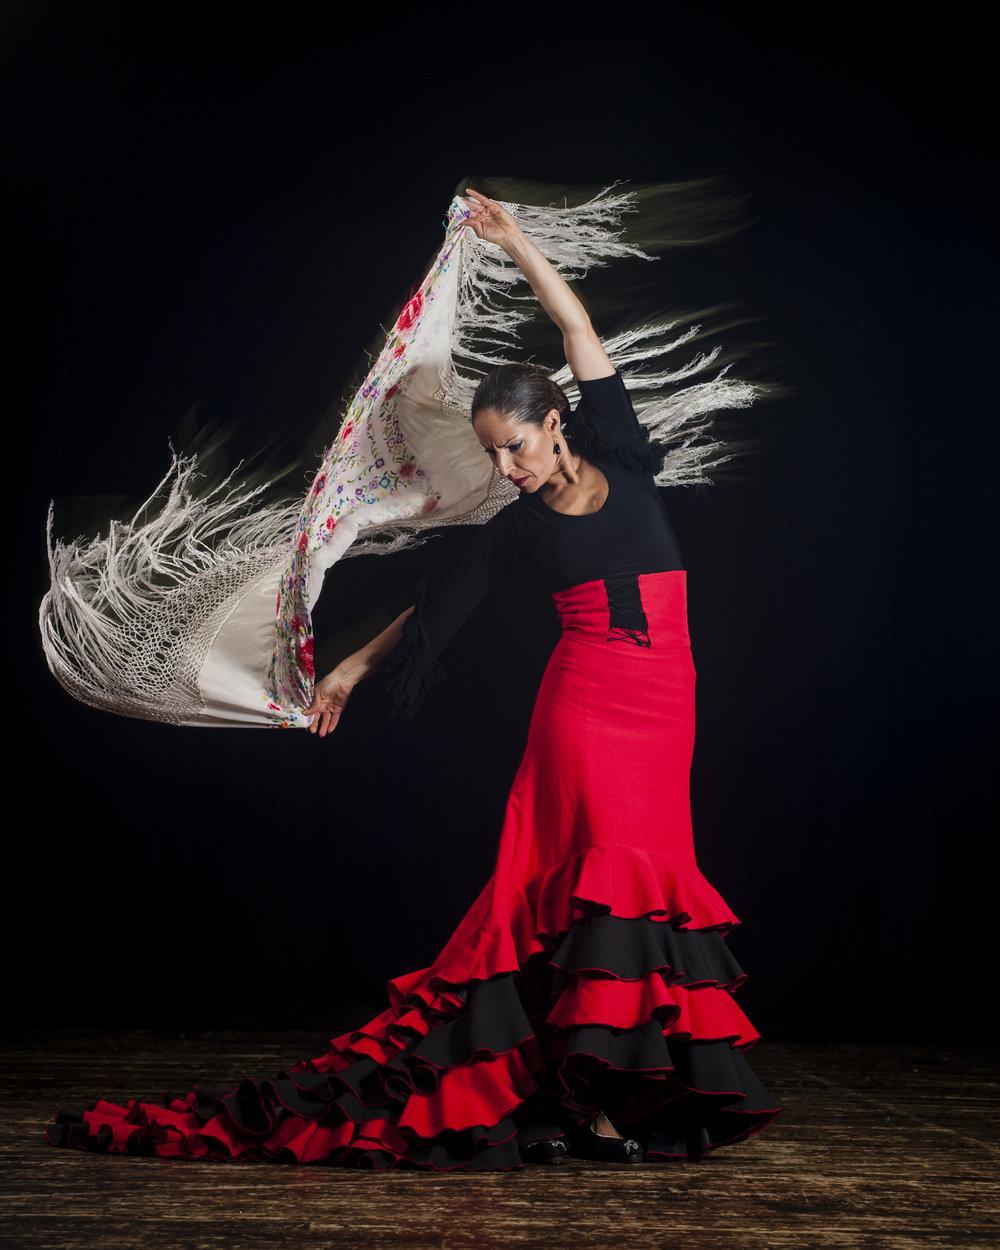 Flamenco_dancer_3467.jpg